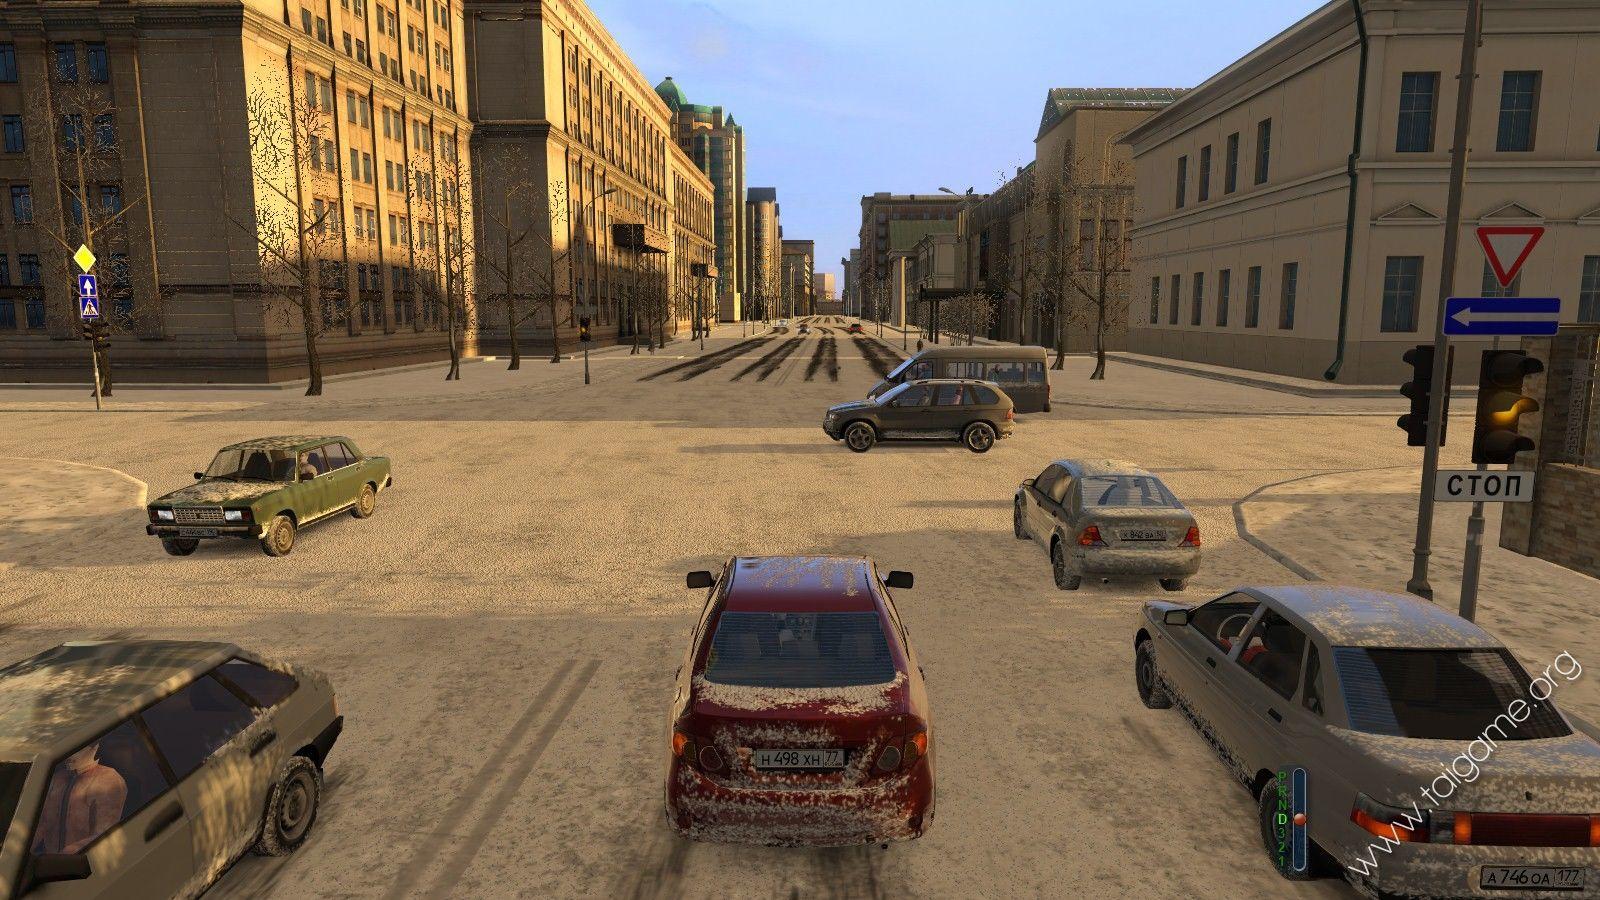 city car driving download free full games racing games. Black Bedroom Furniture Sets. Home Design Ideas